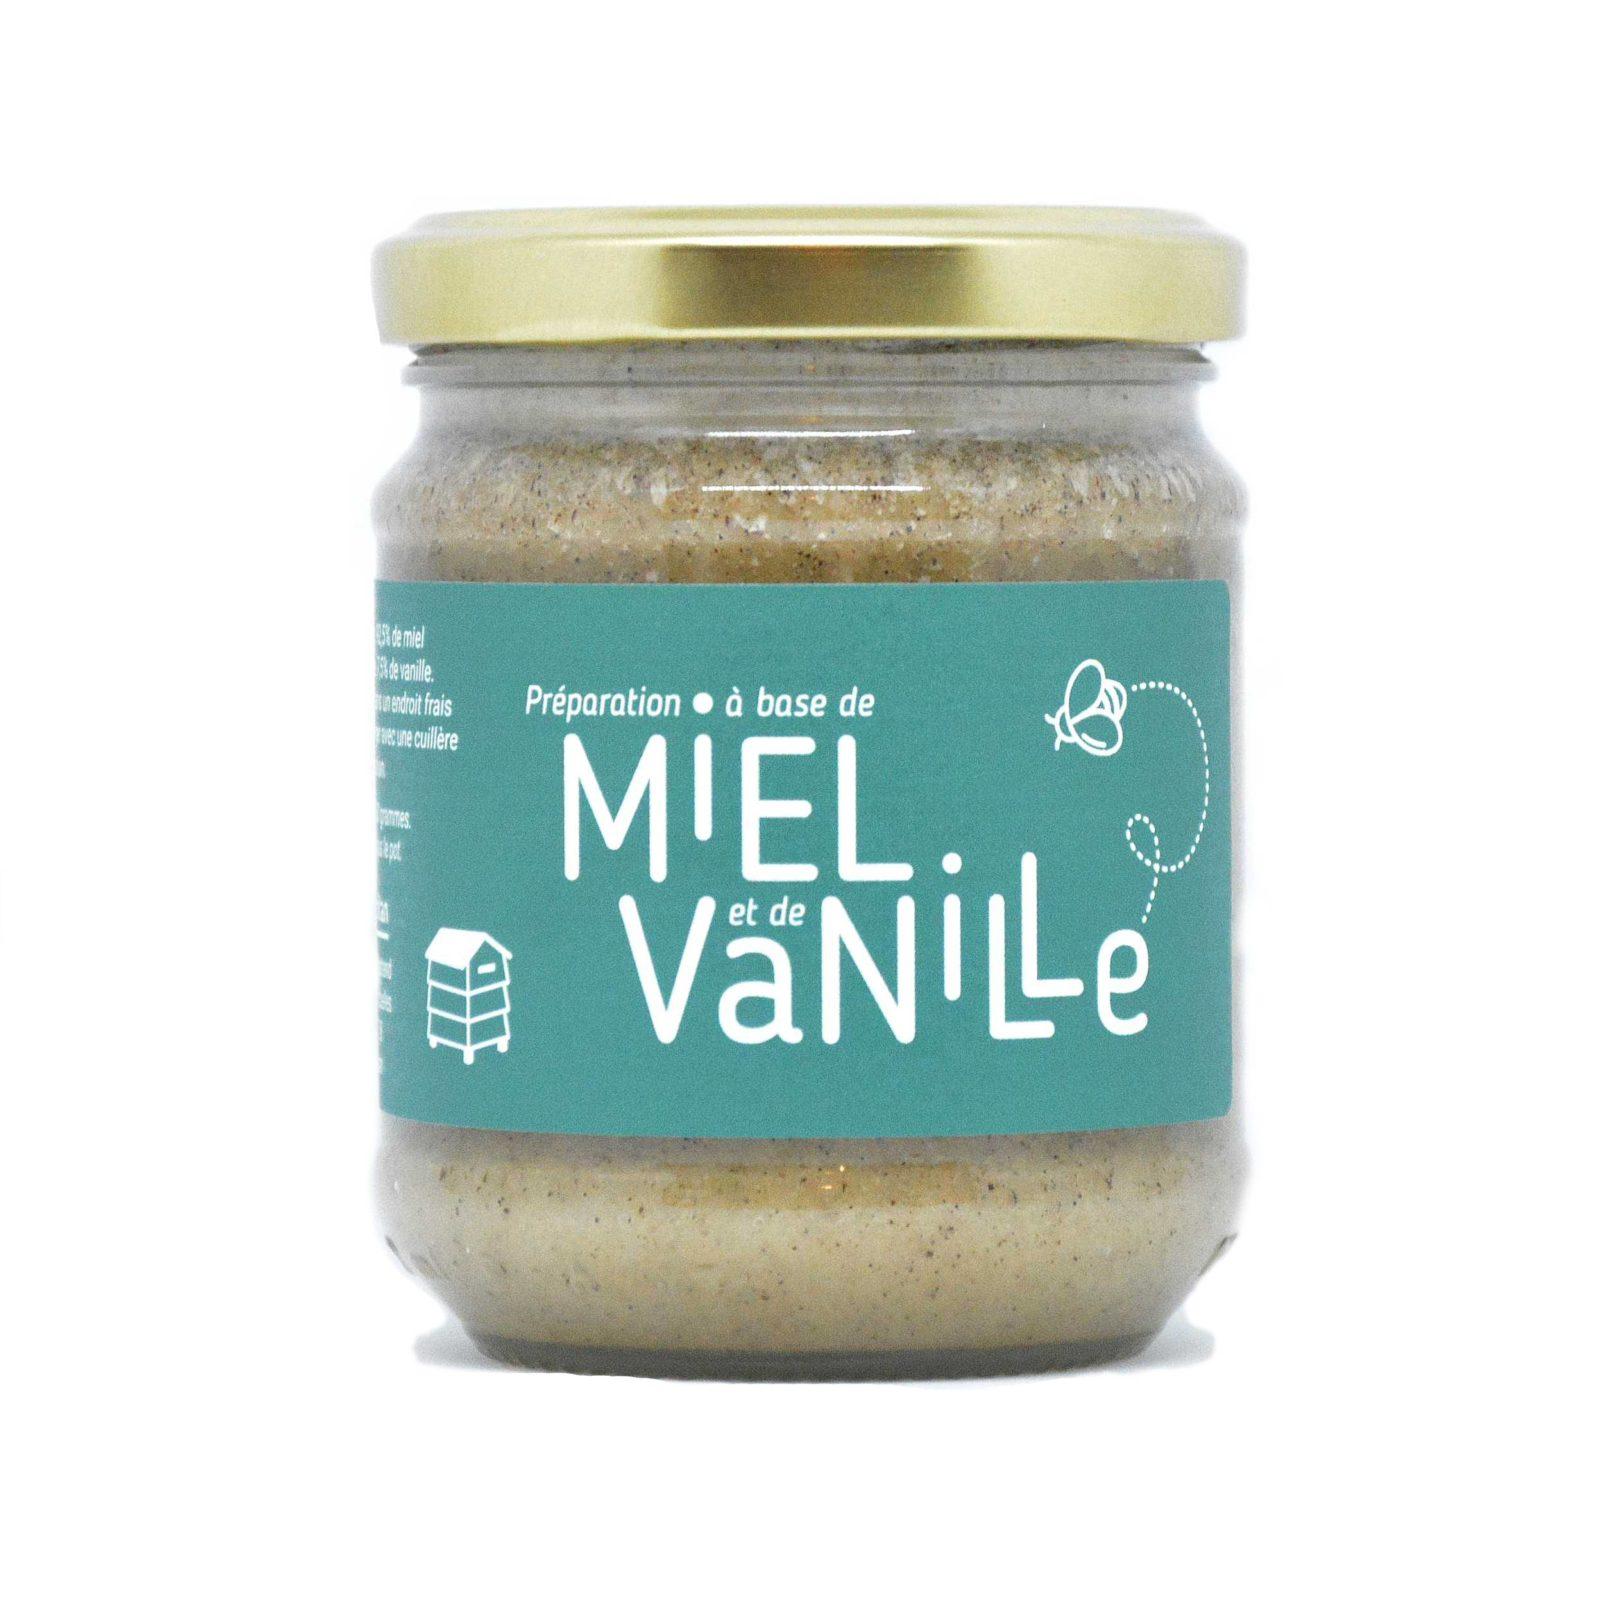 Miel à la vanille uibie apiculteur calvados caen Normandie